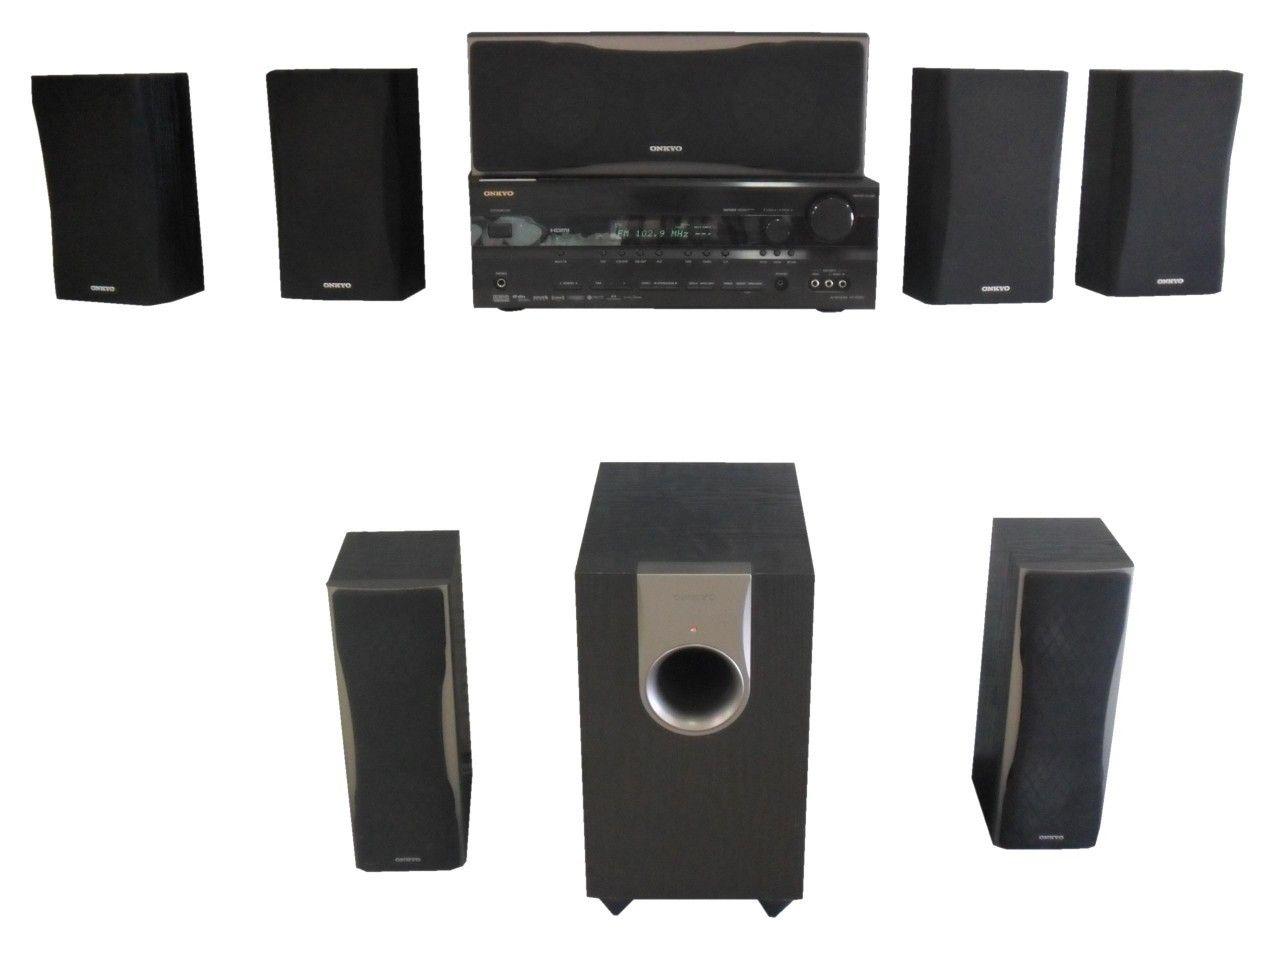 onkyo bookshelf stereo system. plano pawn shop - onkyo ht-r550 surround sound stereo system, $299.00 (http bookshelf system